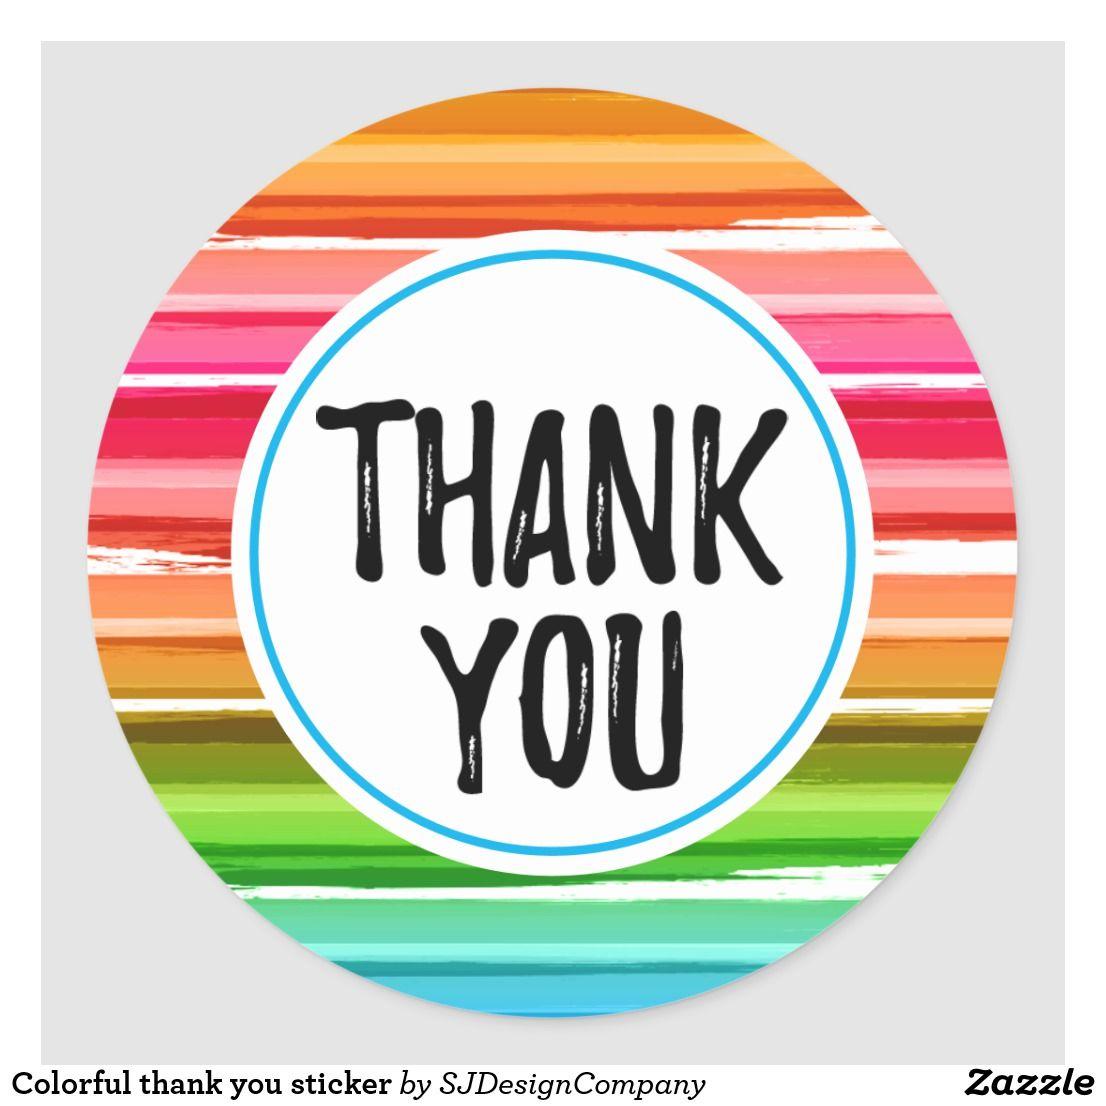 Colorful Thank You Sticker Zazzle Com Thank You Stickers Thank You Poster Thank You Pictures